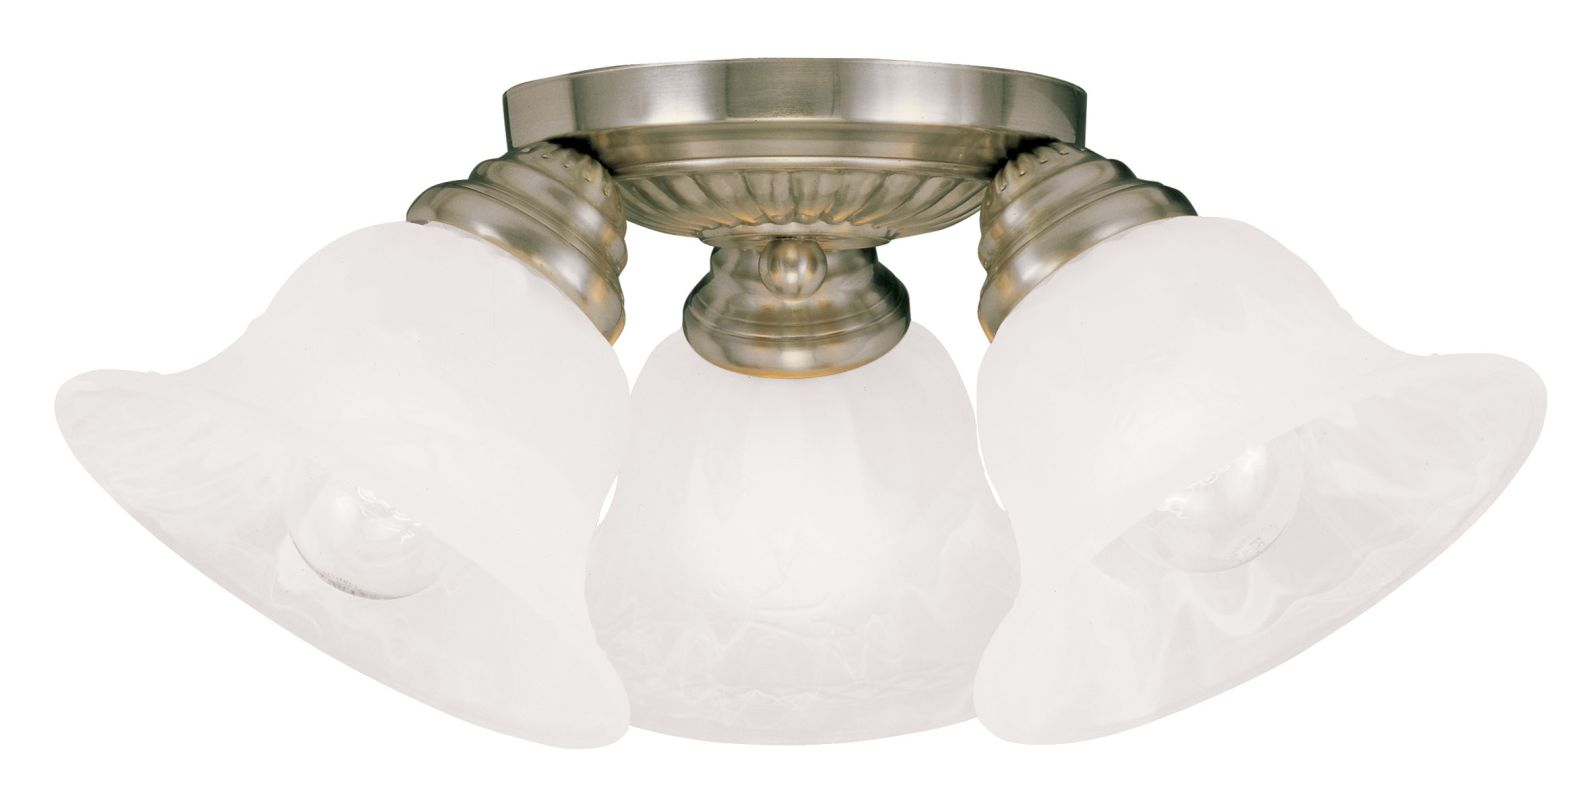 Semi Flush Ceiling Lights Glass Brass Fixture Bathroom: Livex Lighting 1529-01 Antique Brass Edgemont Semi-Flush